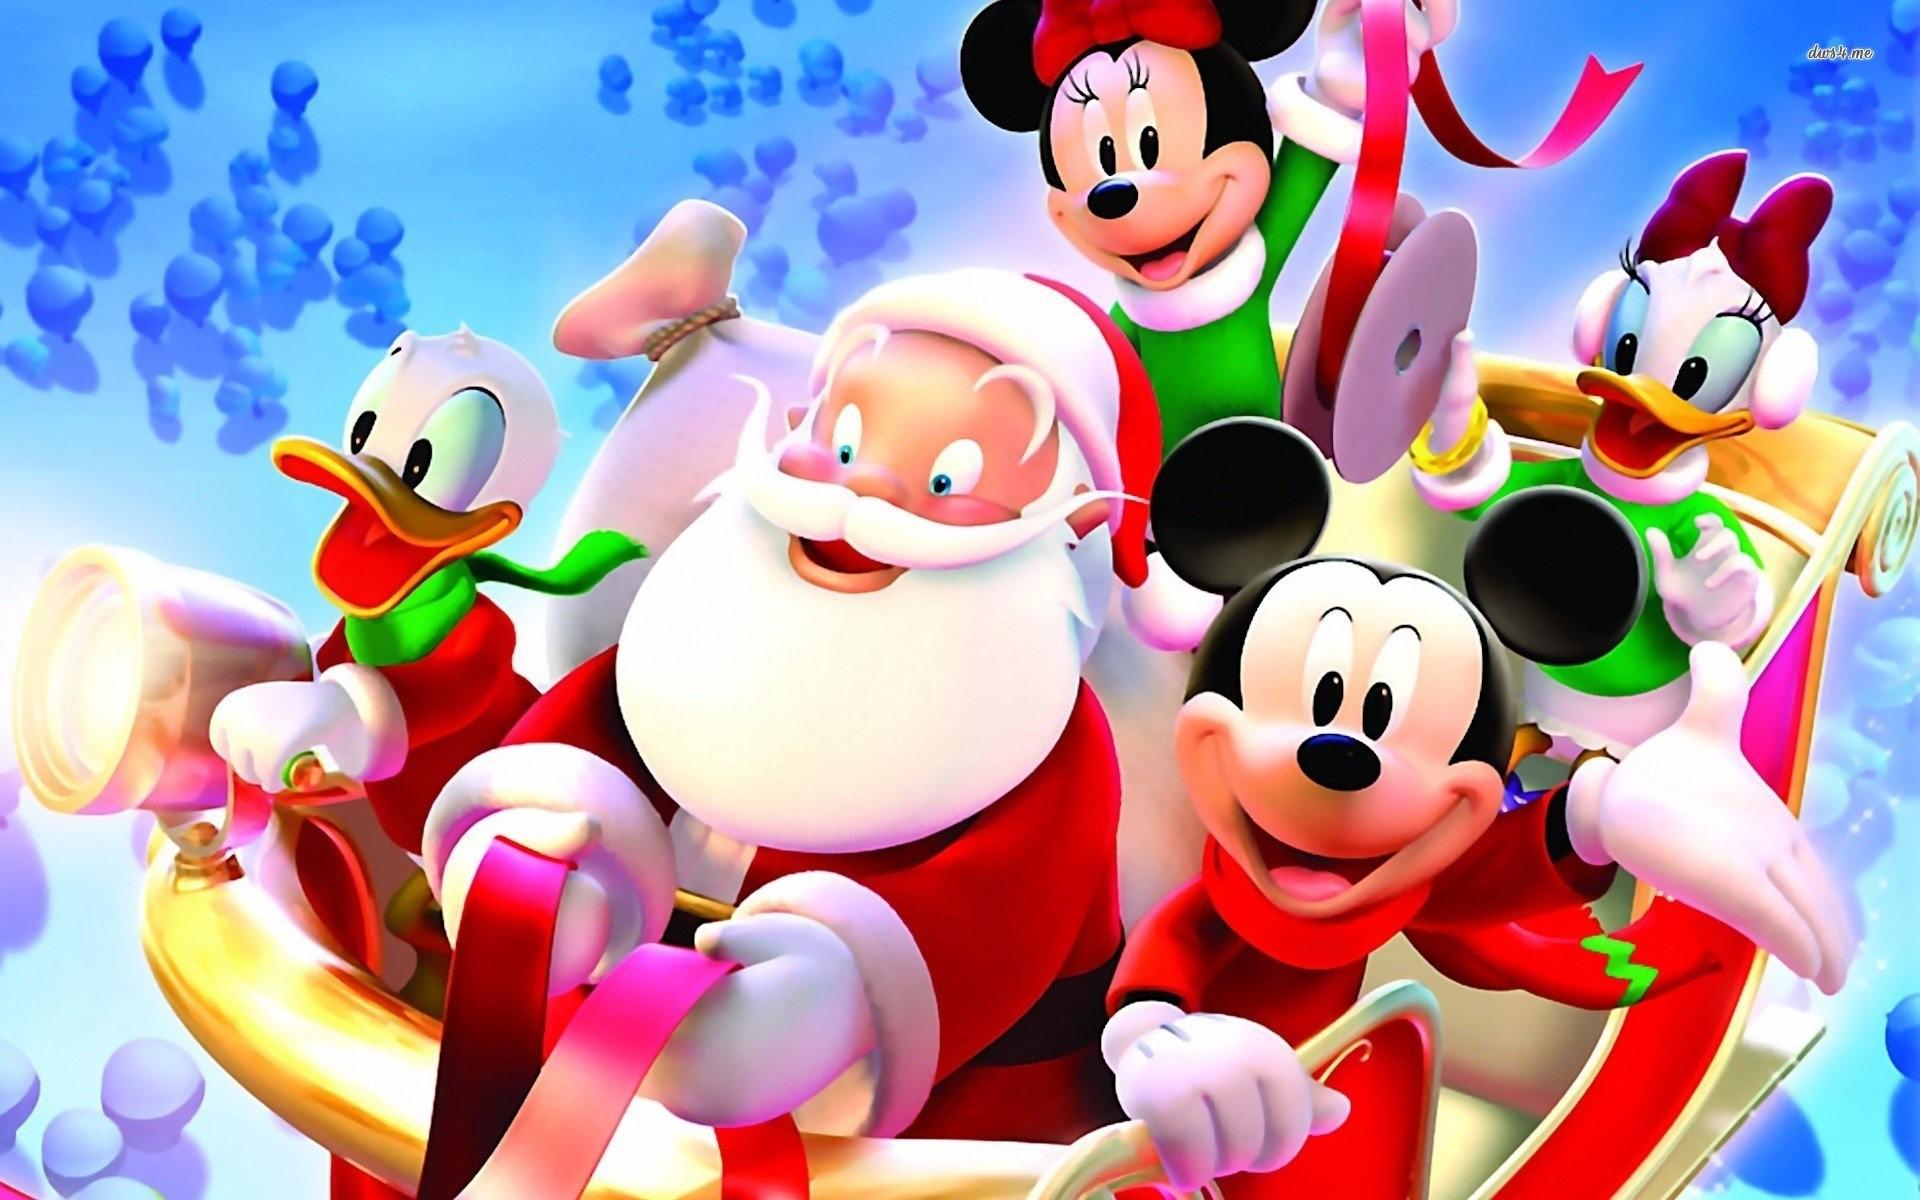 Christmas merry christmas santa santa claus mickey mouse minnie mouse daffy  duck disney.